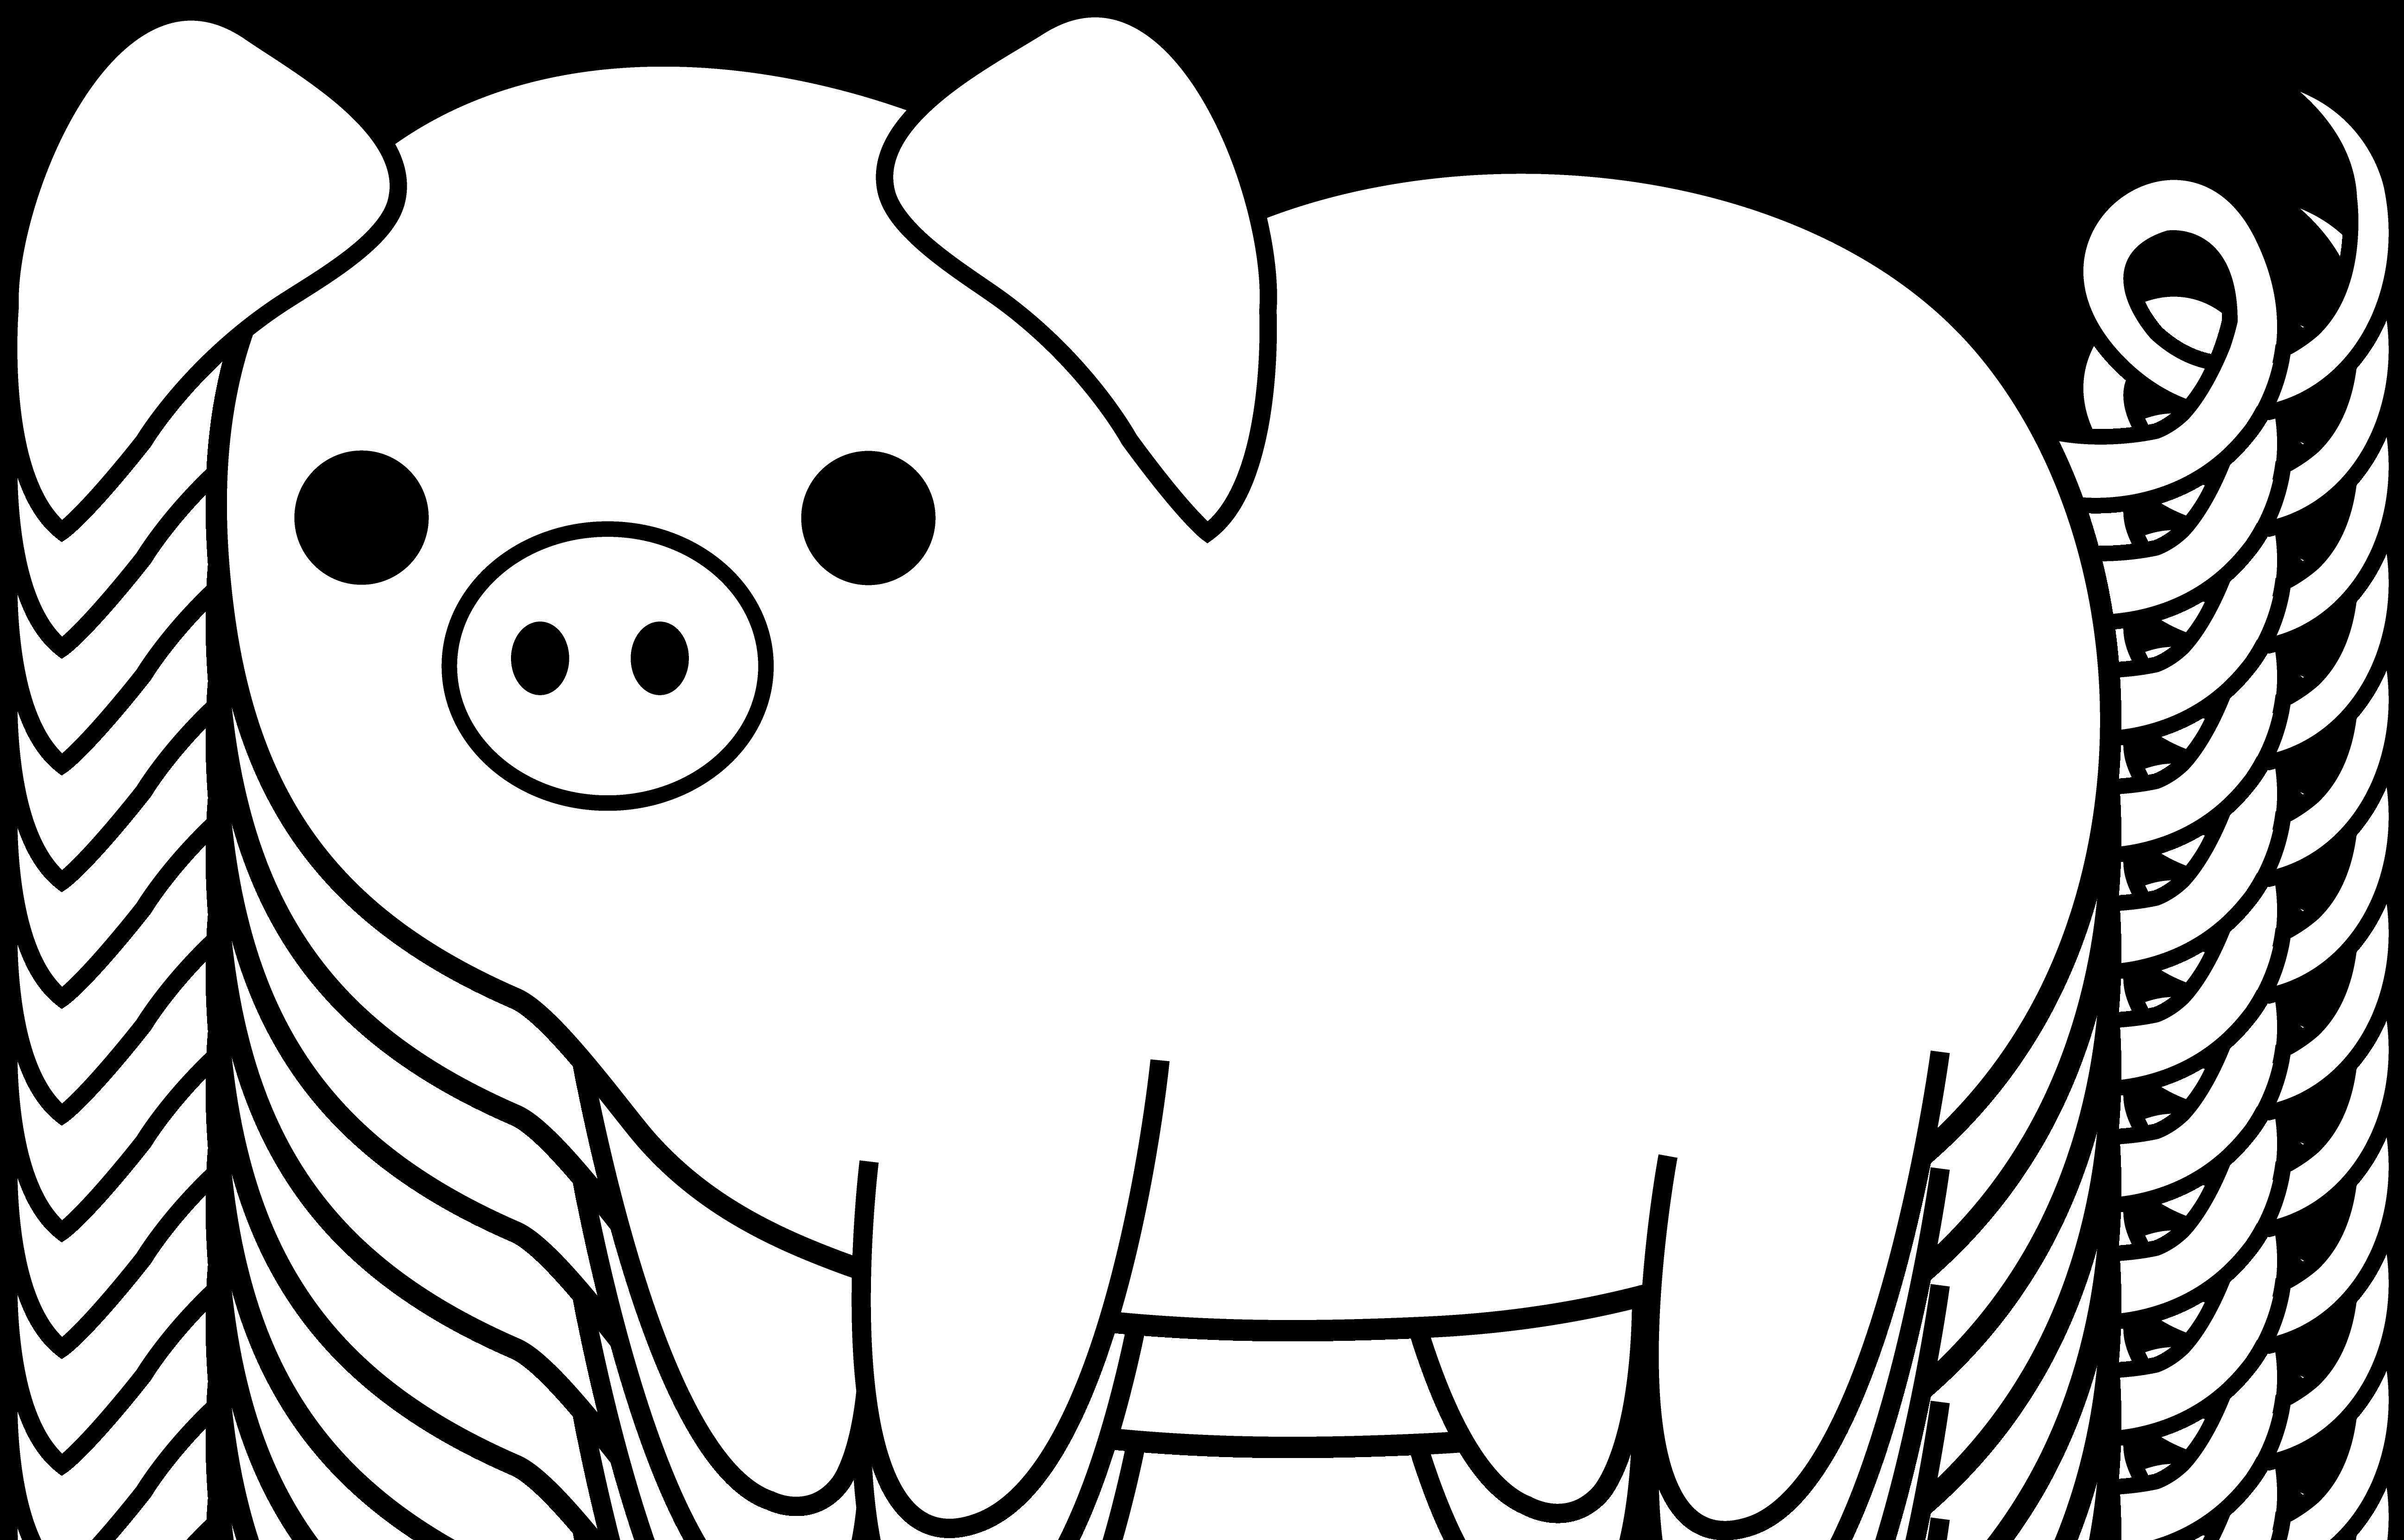 Pig Line Art - Cliparts.co